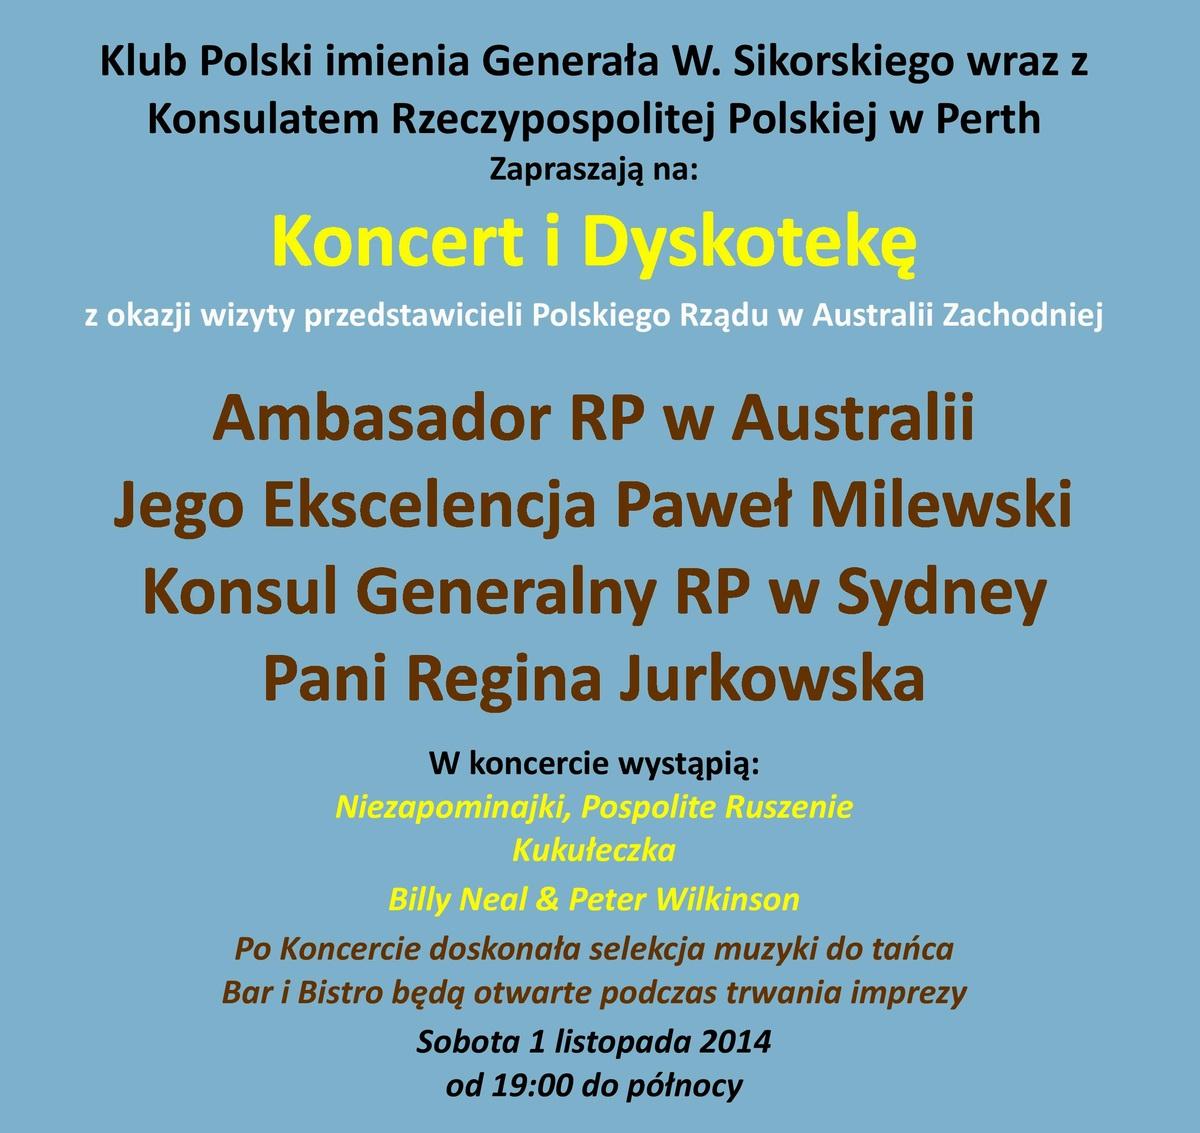 Ambassador, Award Ceremony and Concert 1/11/2014